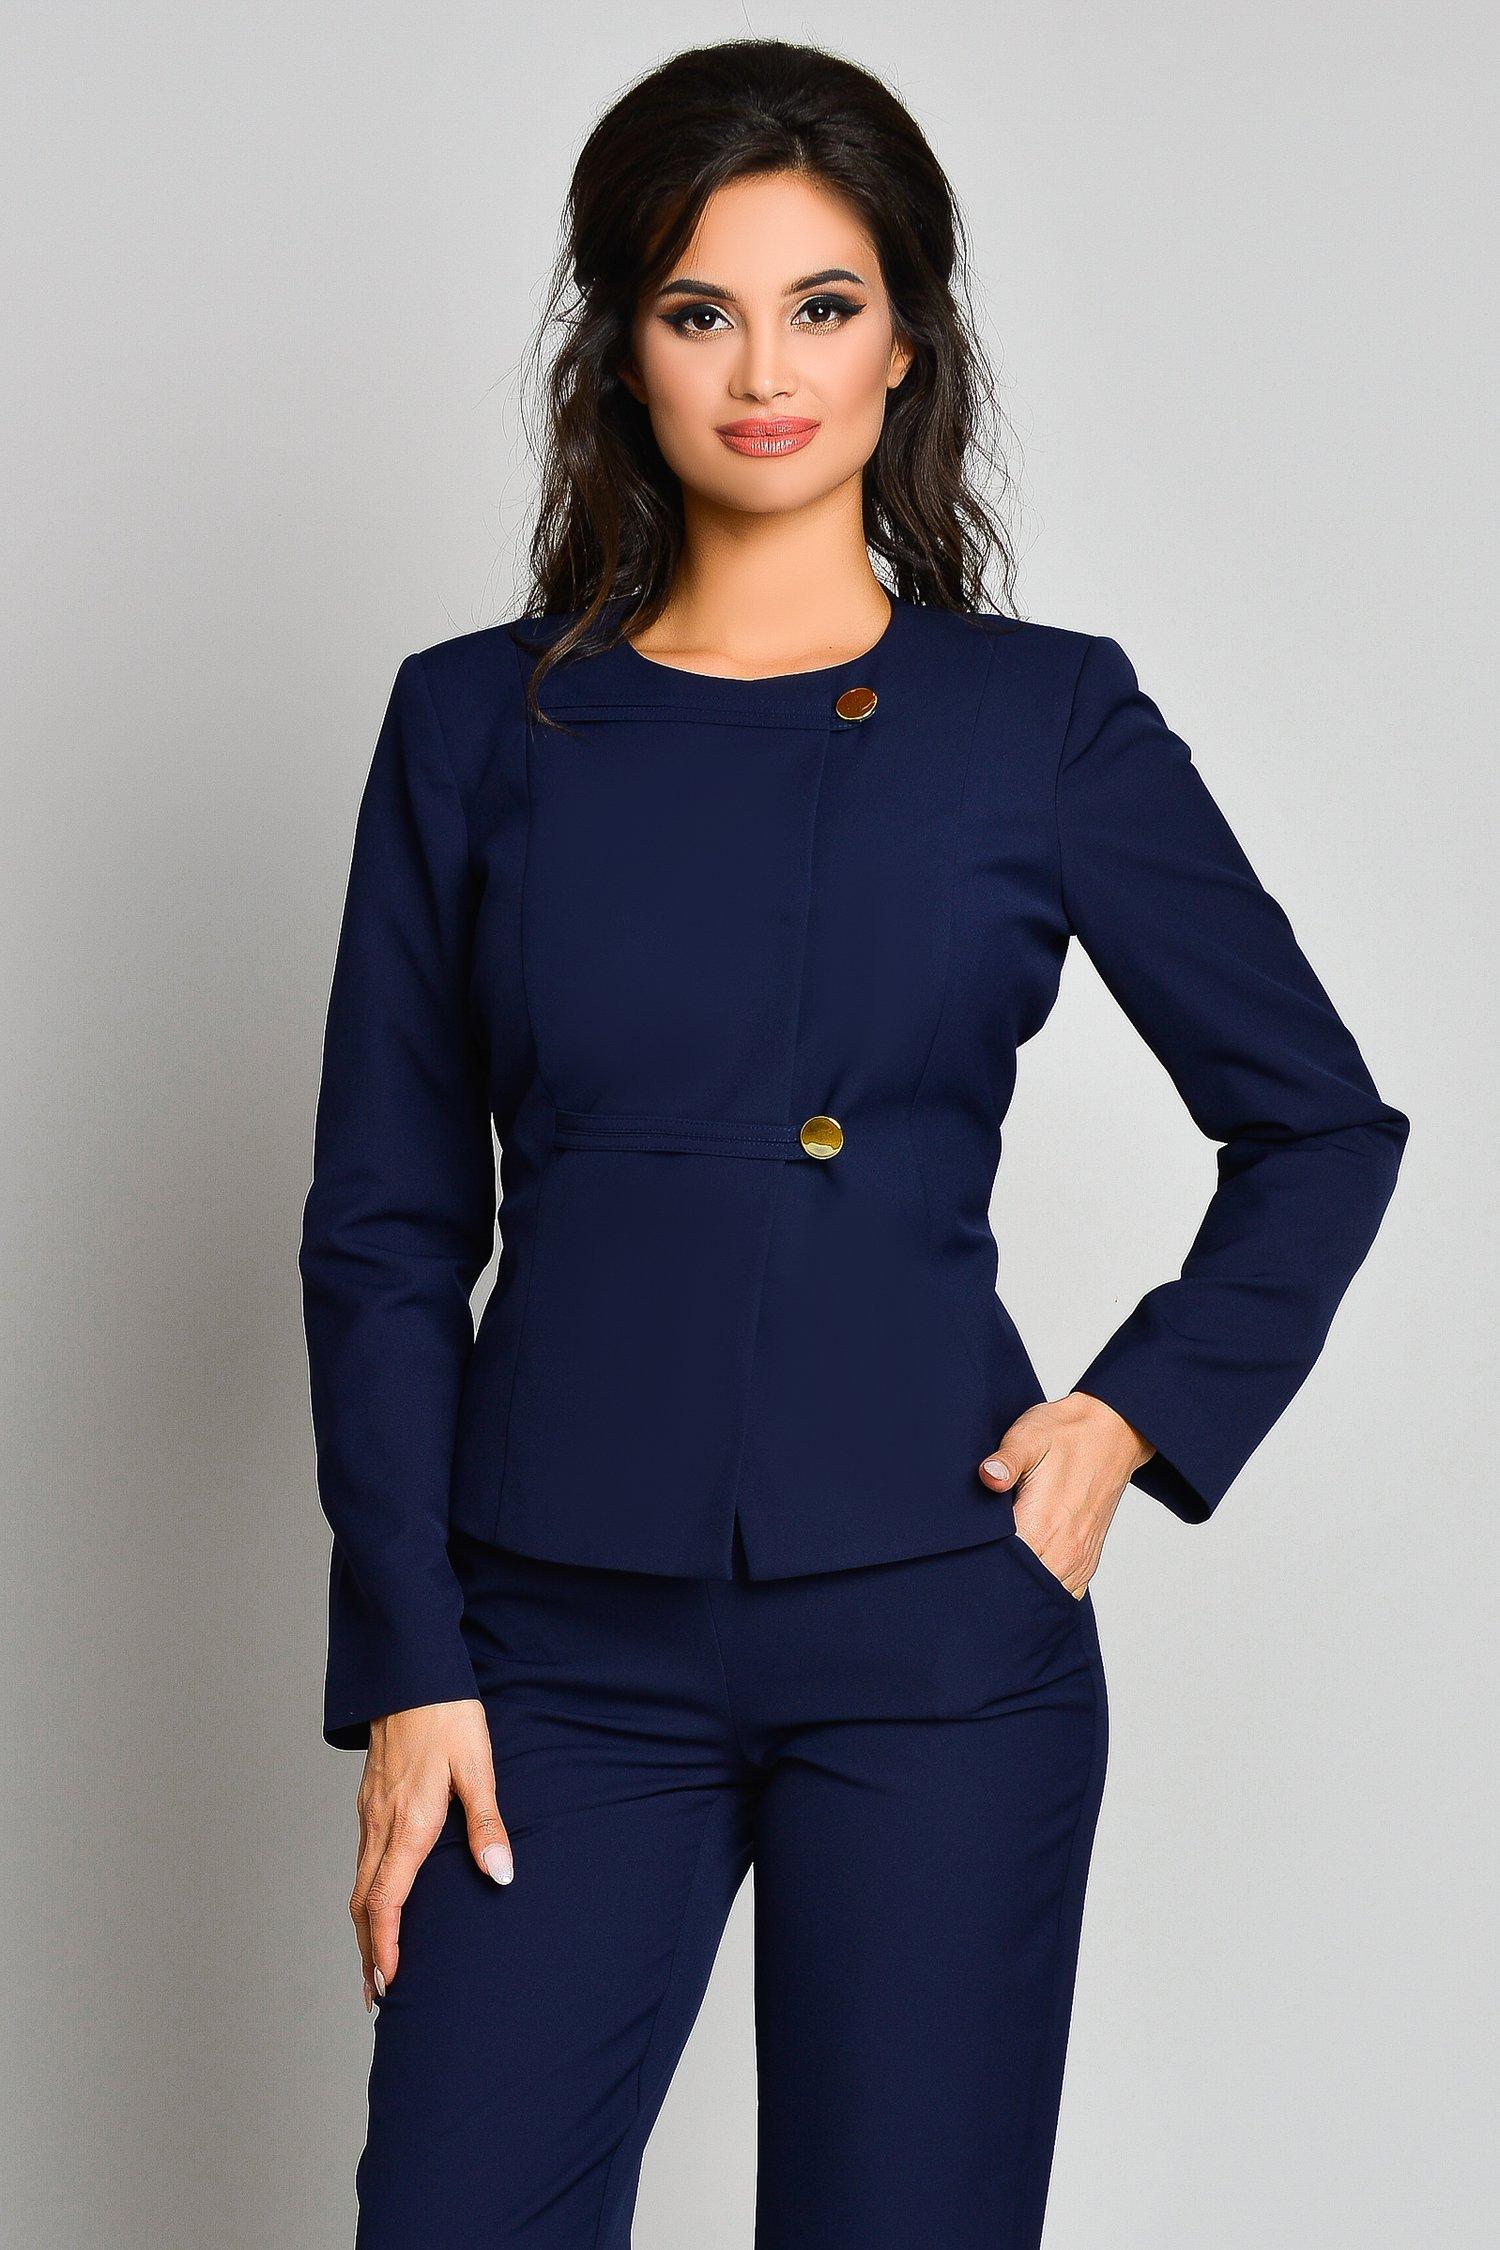 Sacou Ginette Bleumarin Office Elegant, colectia 2019